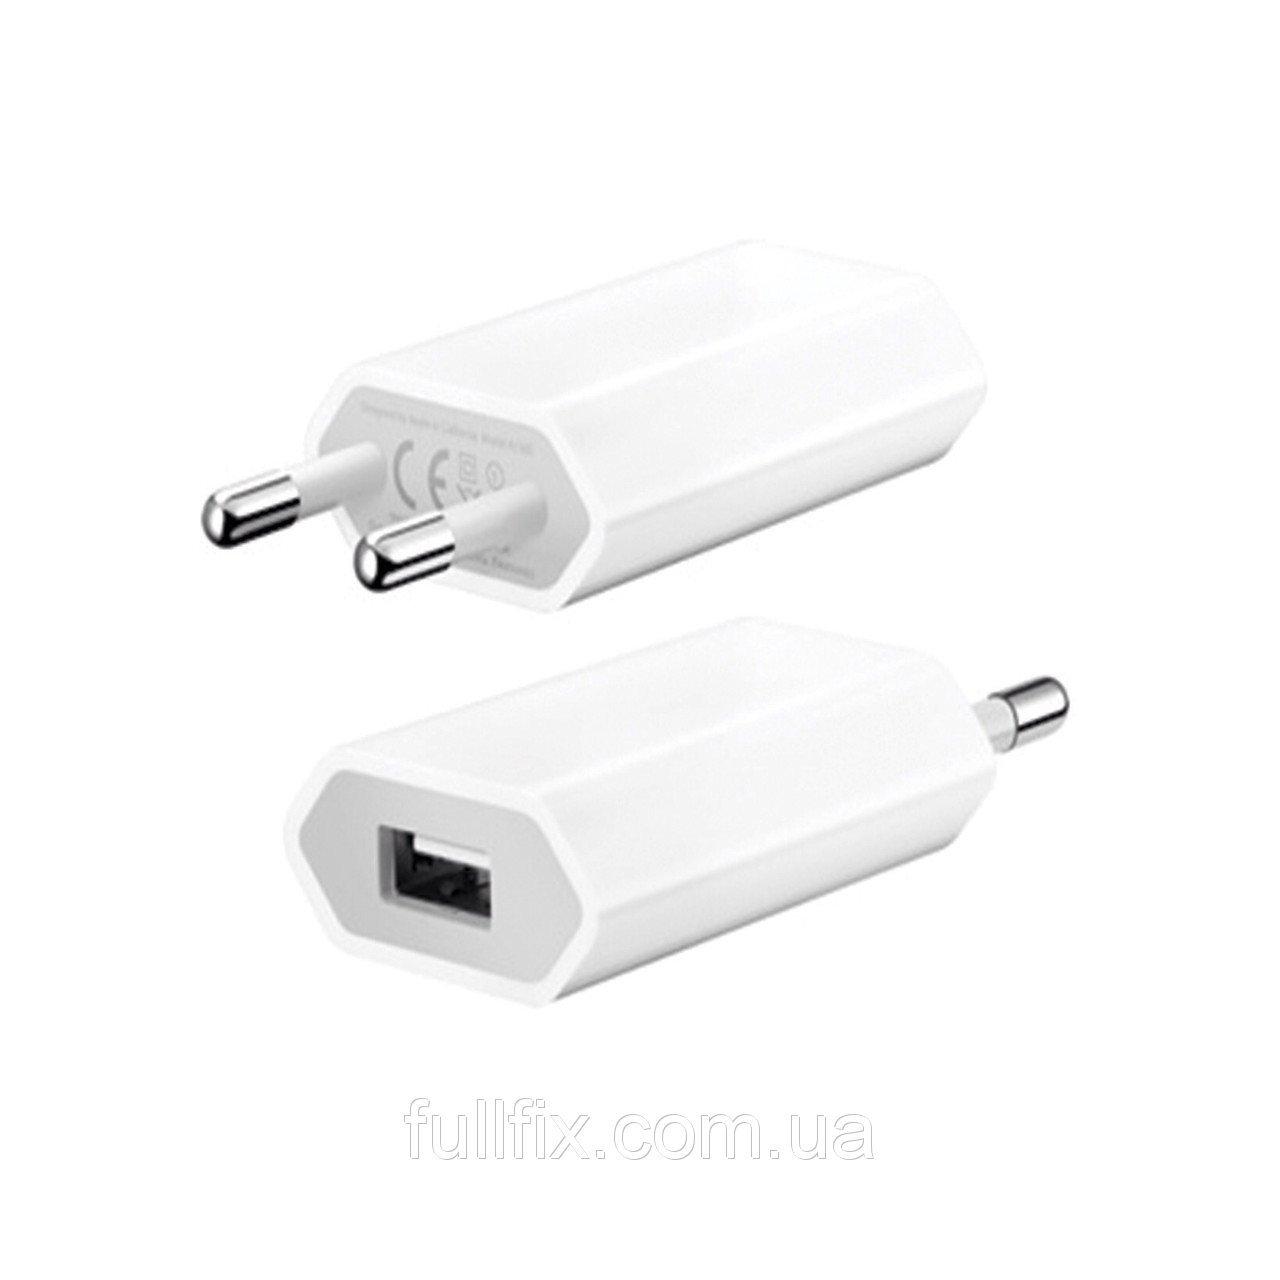 12df6e4d8ba AKTrend original - Cable cargador para Apple iPhone 6 Plus / 5 / 5s / 5c /  4 / 4G / 4S / 3G / 3GS , iPad 1 / 2 / 3: Amazon.es: Electrónica